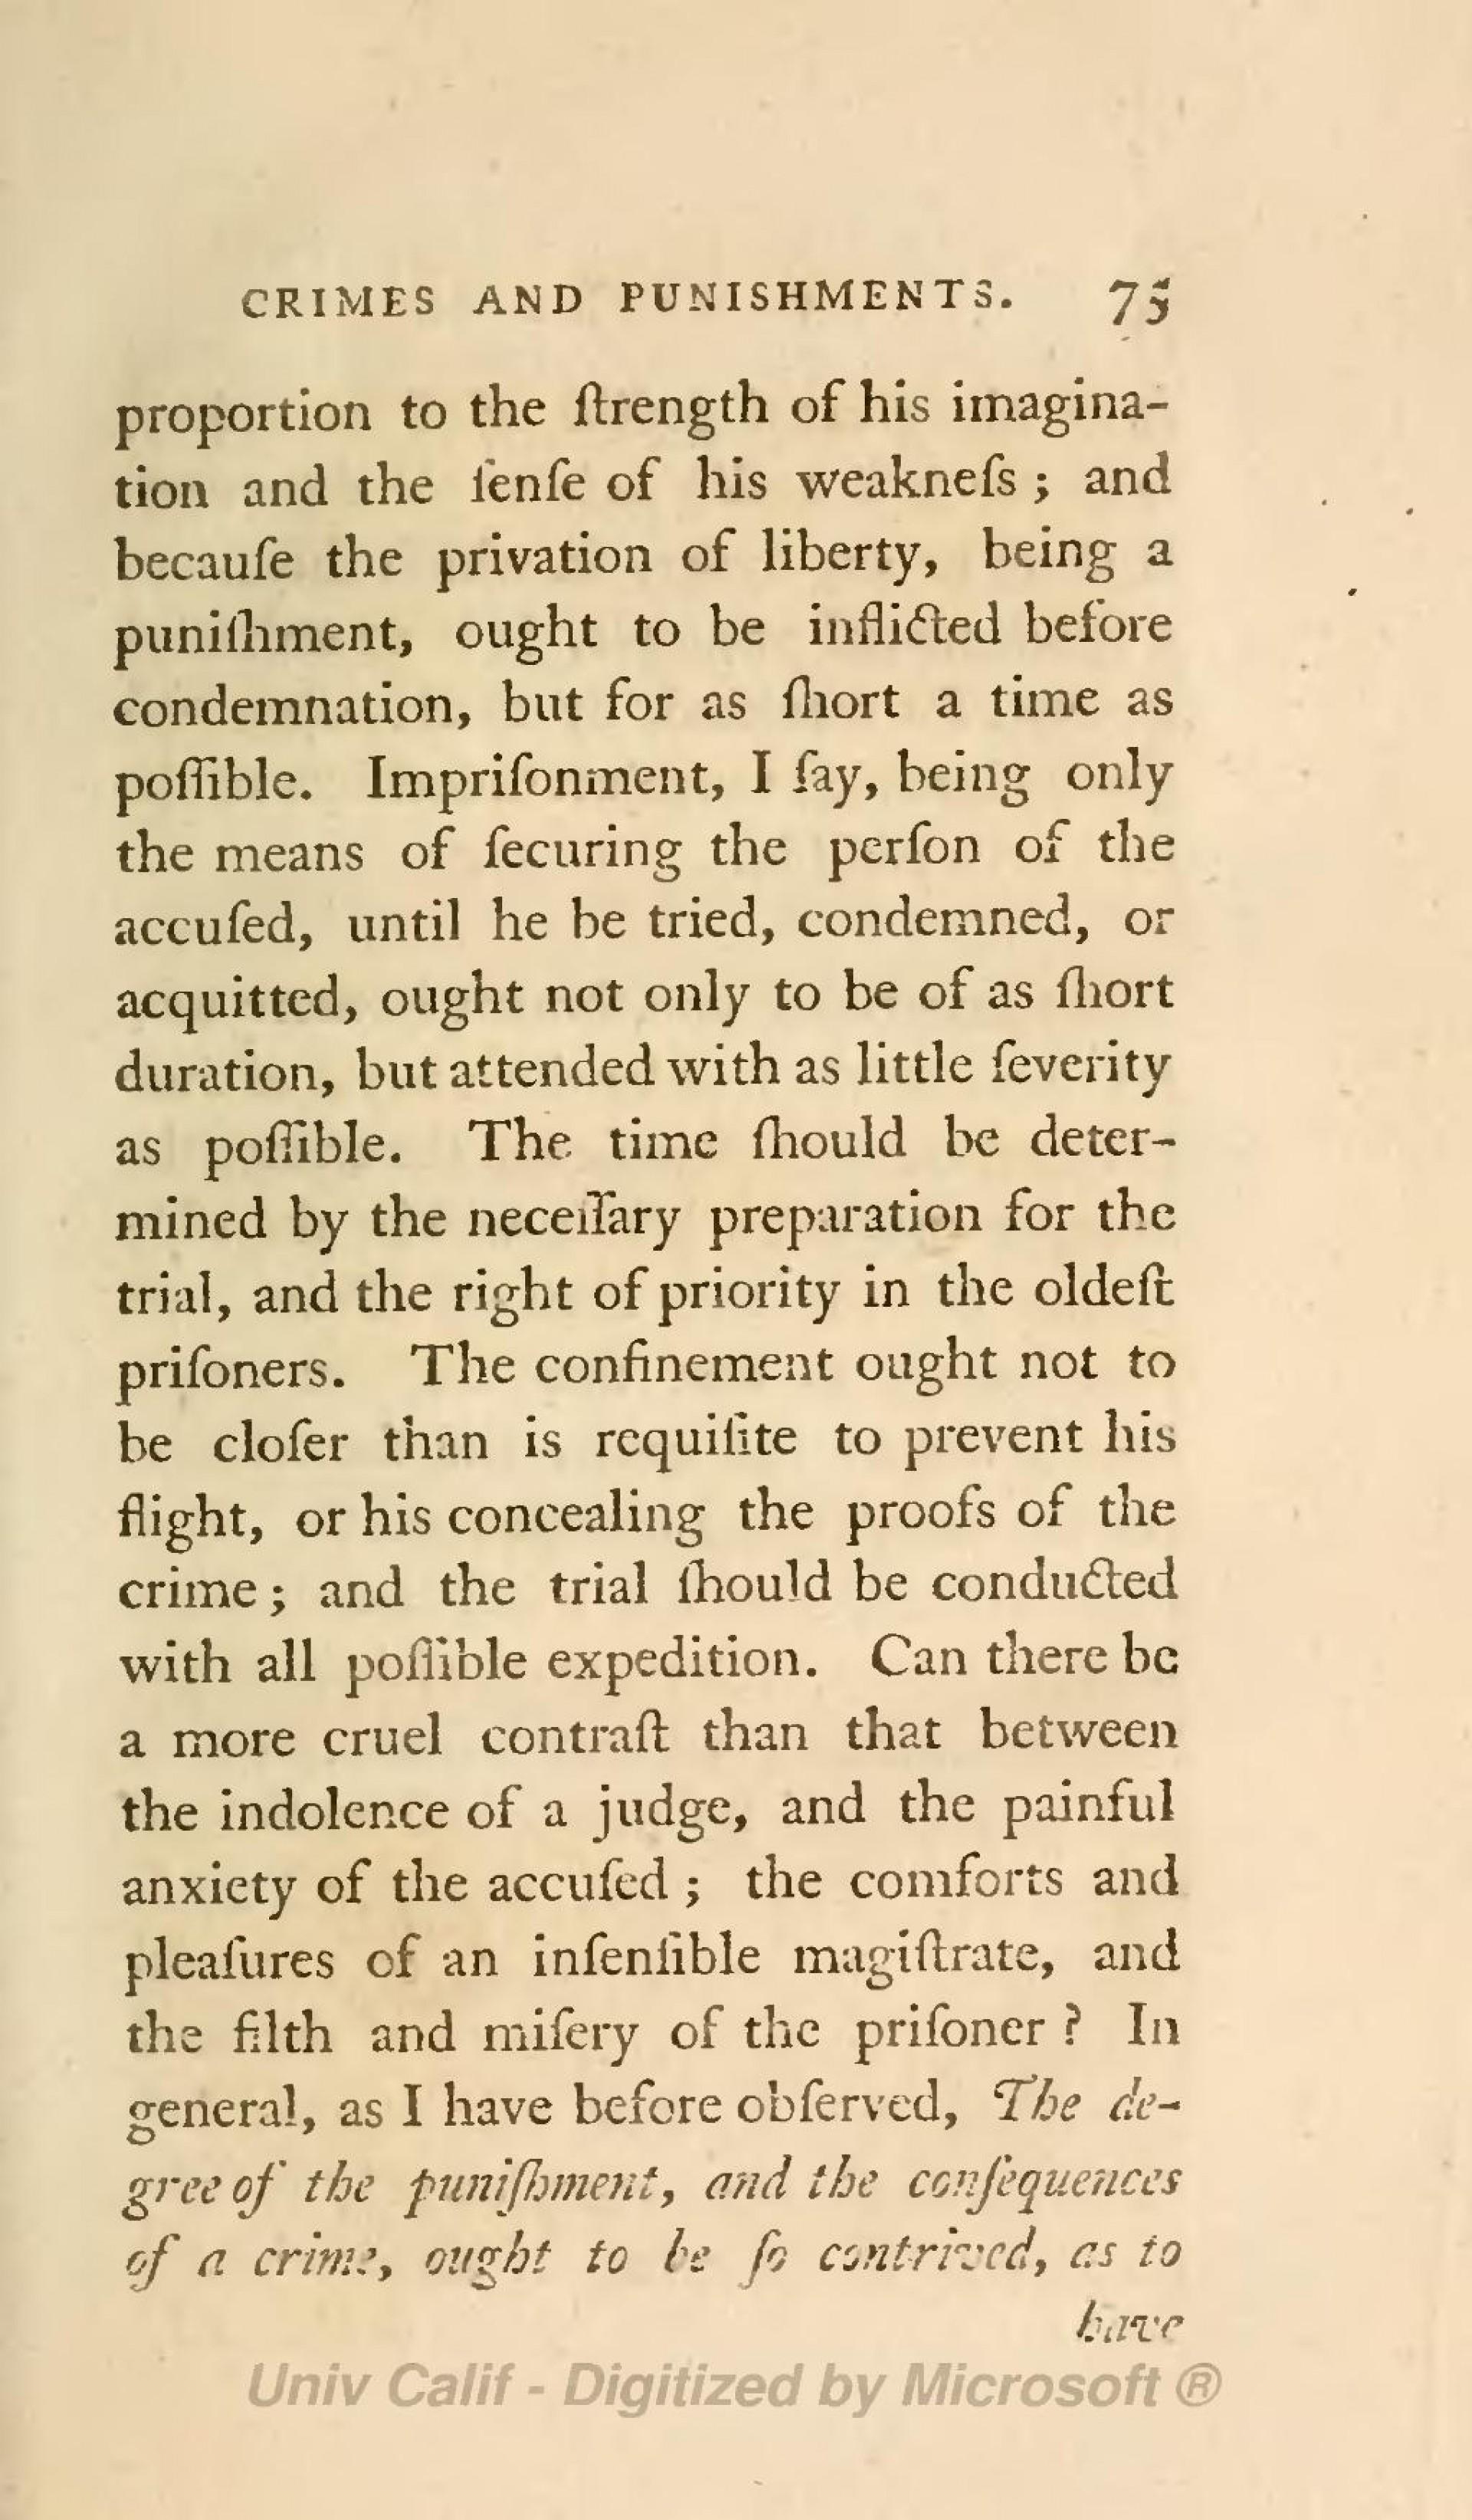 018 Page87 1024px Essay On Crimes Ands 1775 Djvu Example Crime And Wondrous Punishment Outline Pdf Ielts 1920